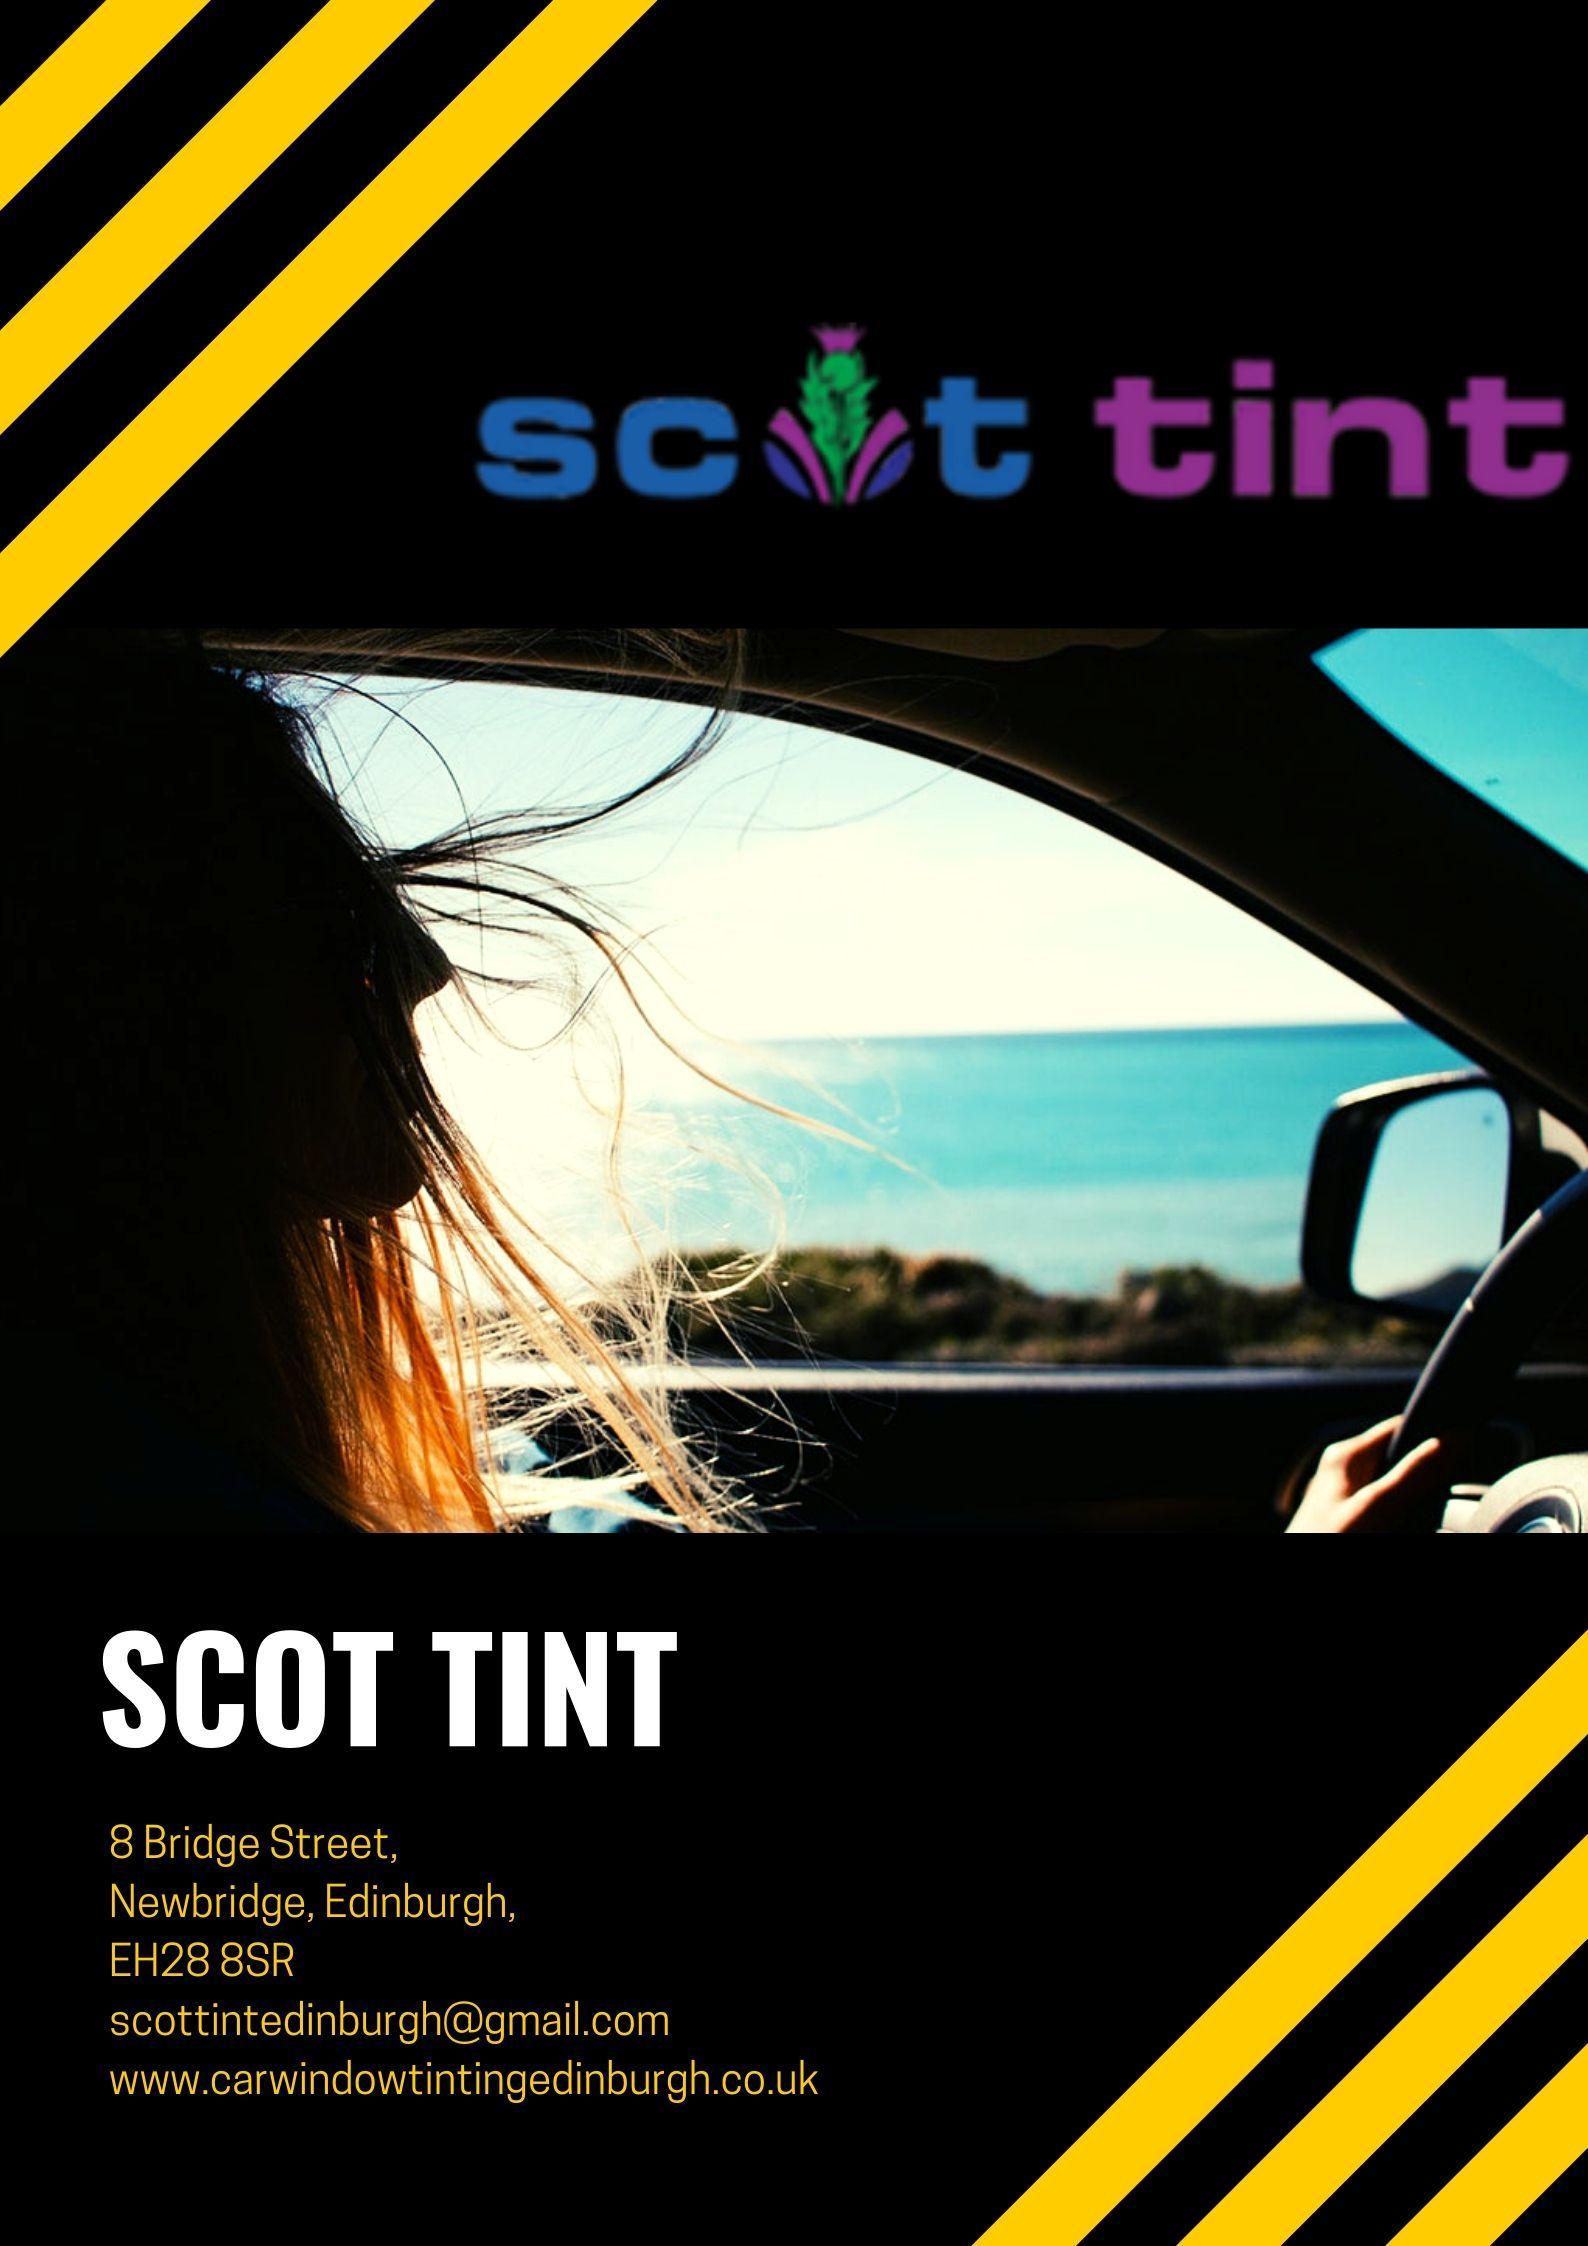 Car Window Tinting 861032022488319305 Car window tinting